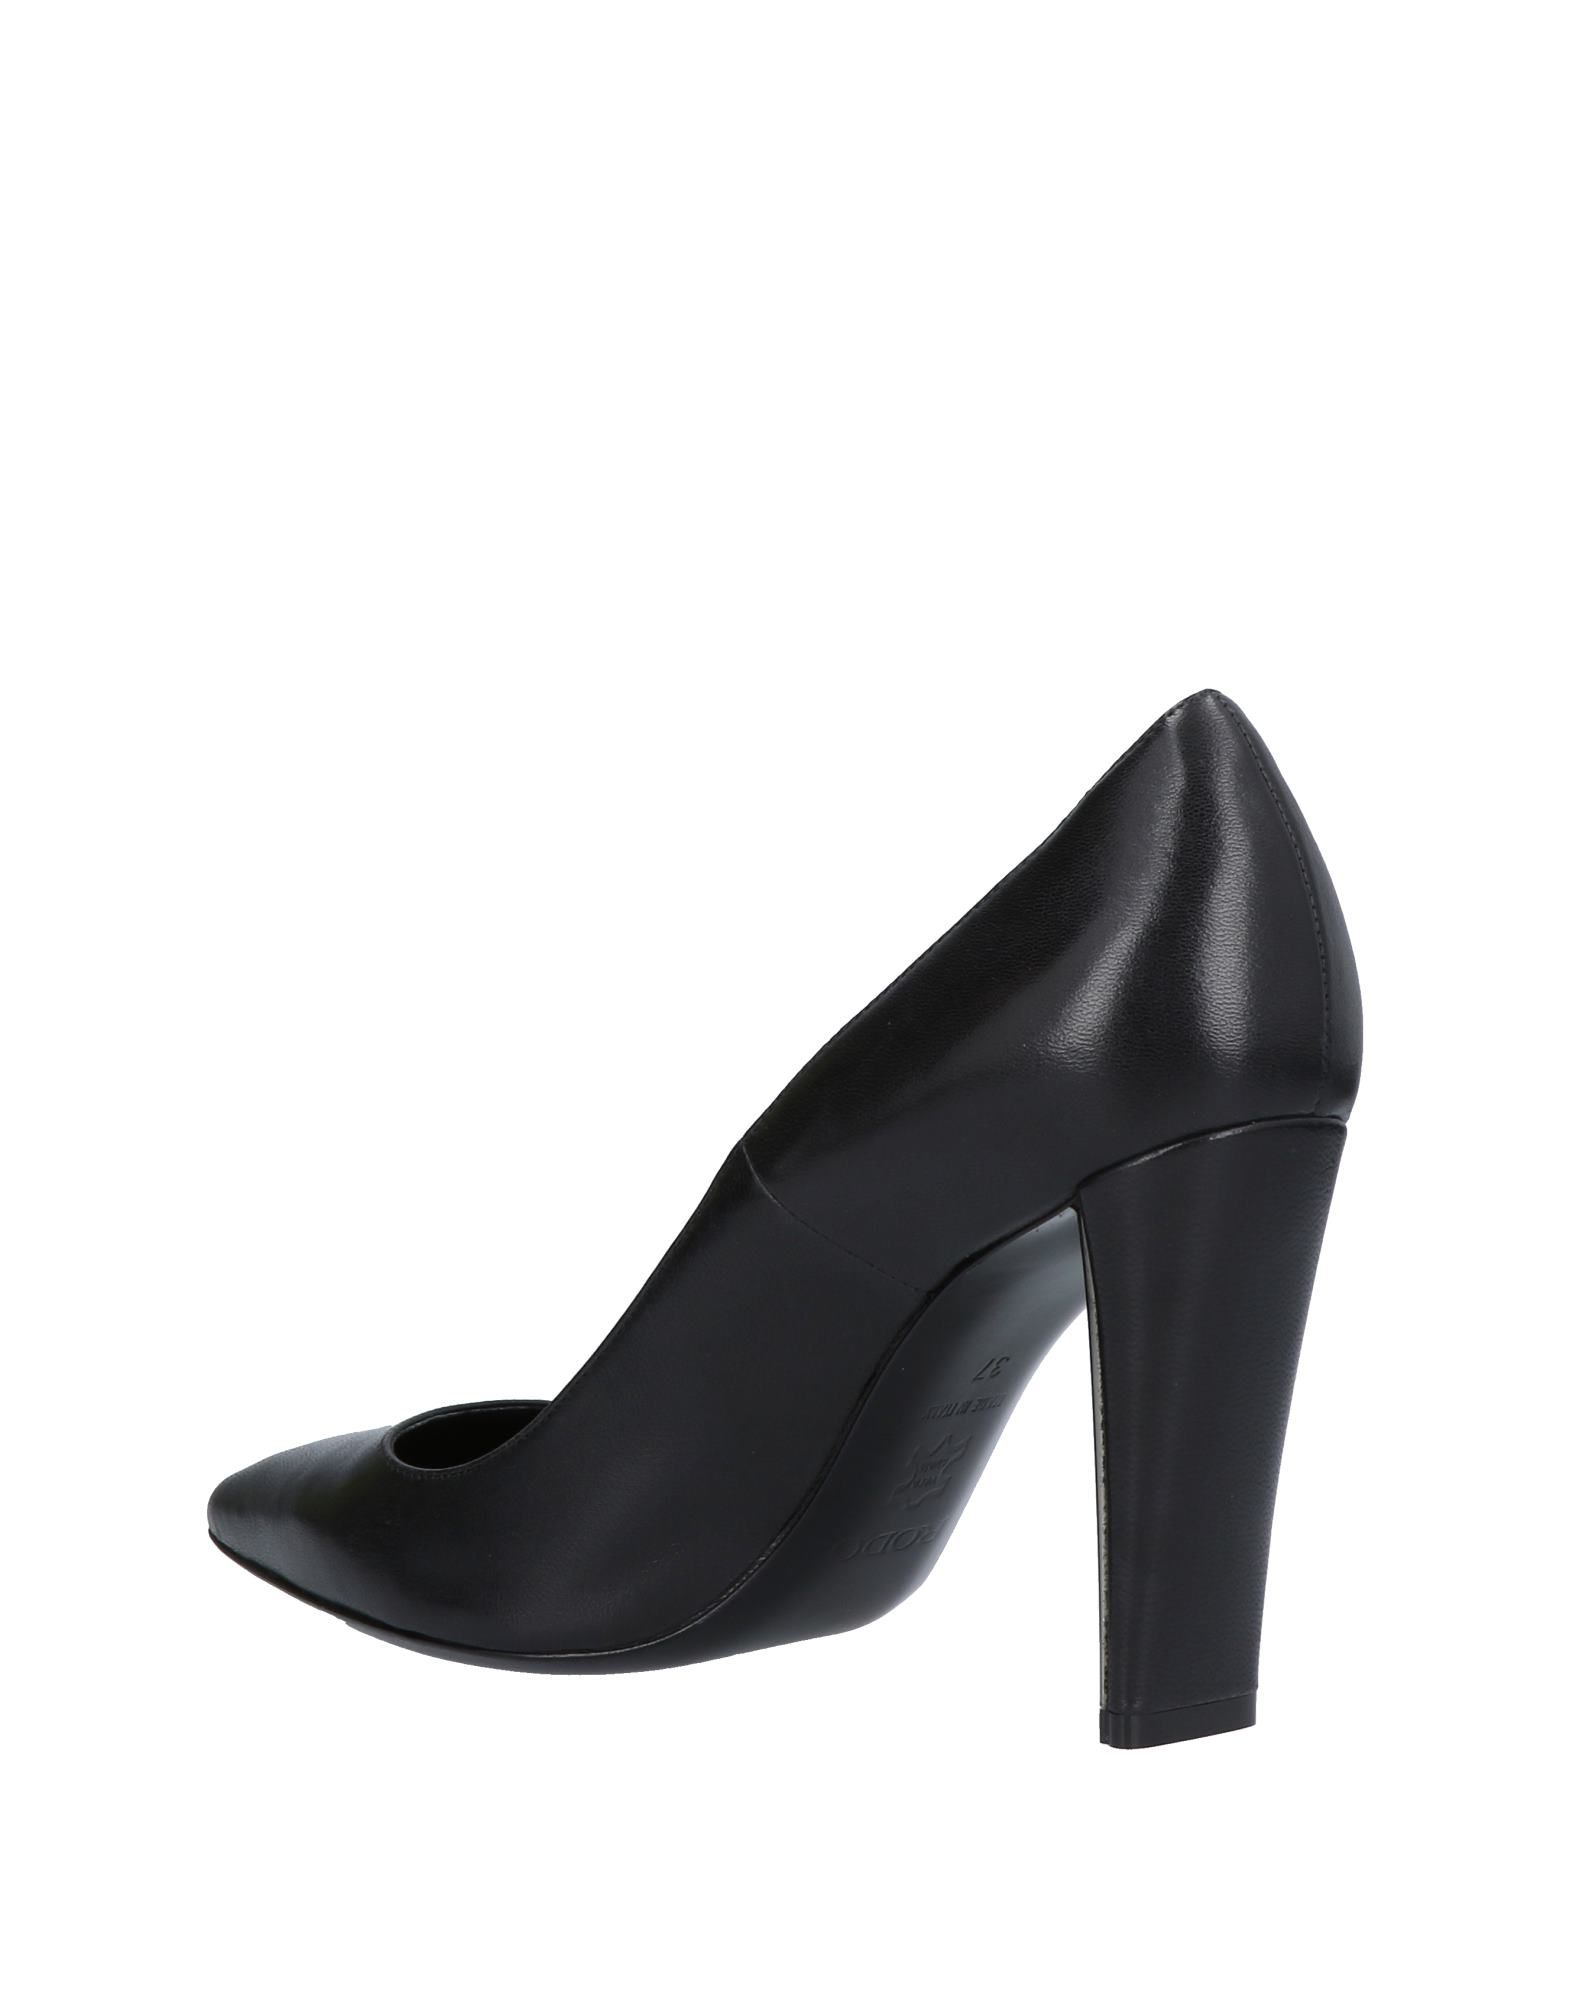 Stilvolle Damen billige Schuhe Rodo Pumps Damen Stilvolle  11454036SL 26c1e1